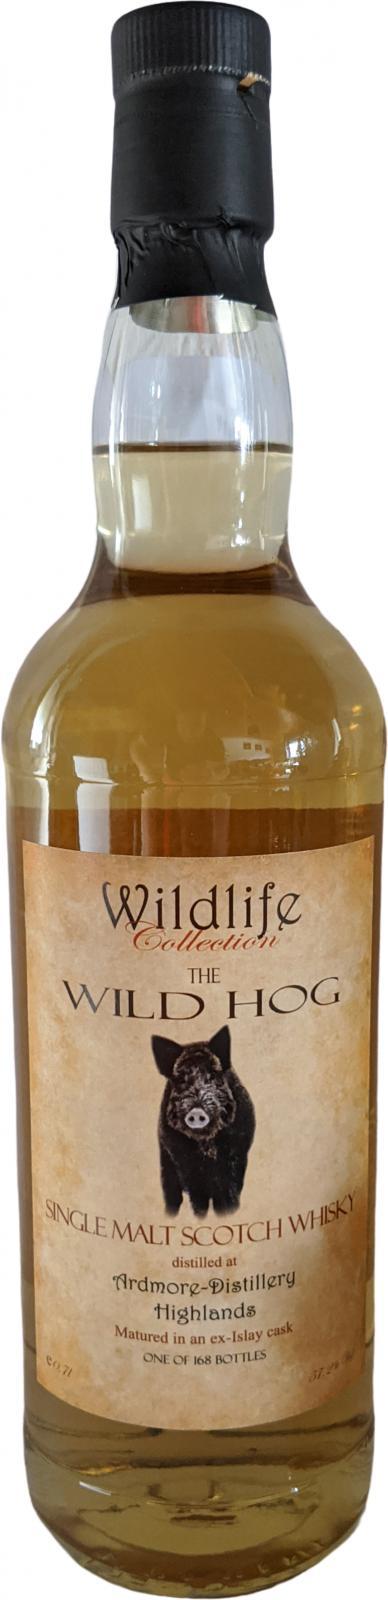 Ardmore The Wild Hog Whk